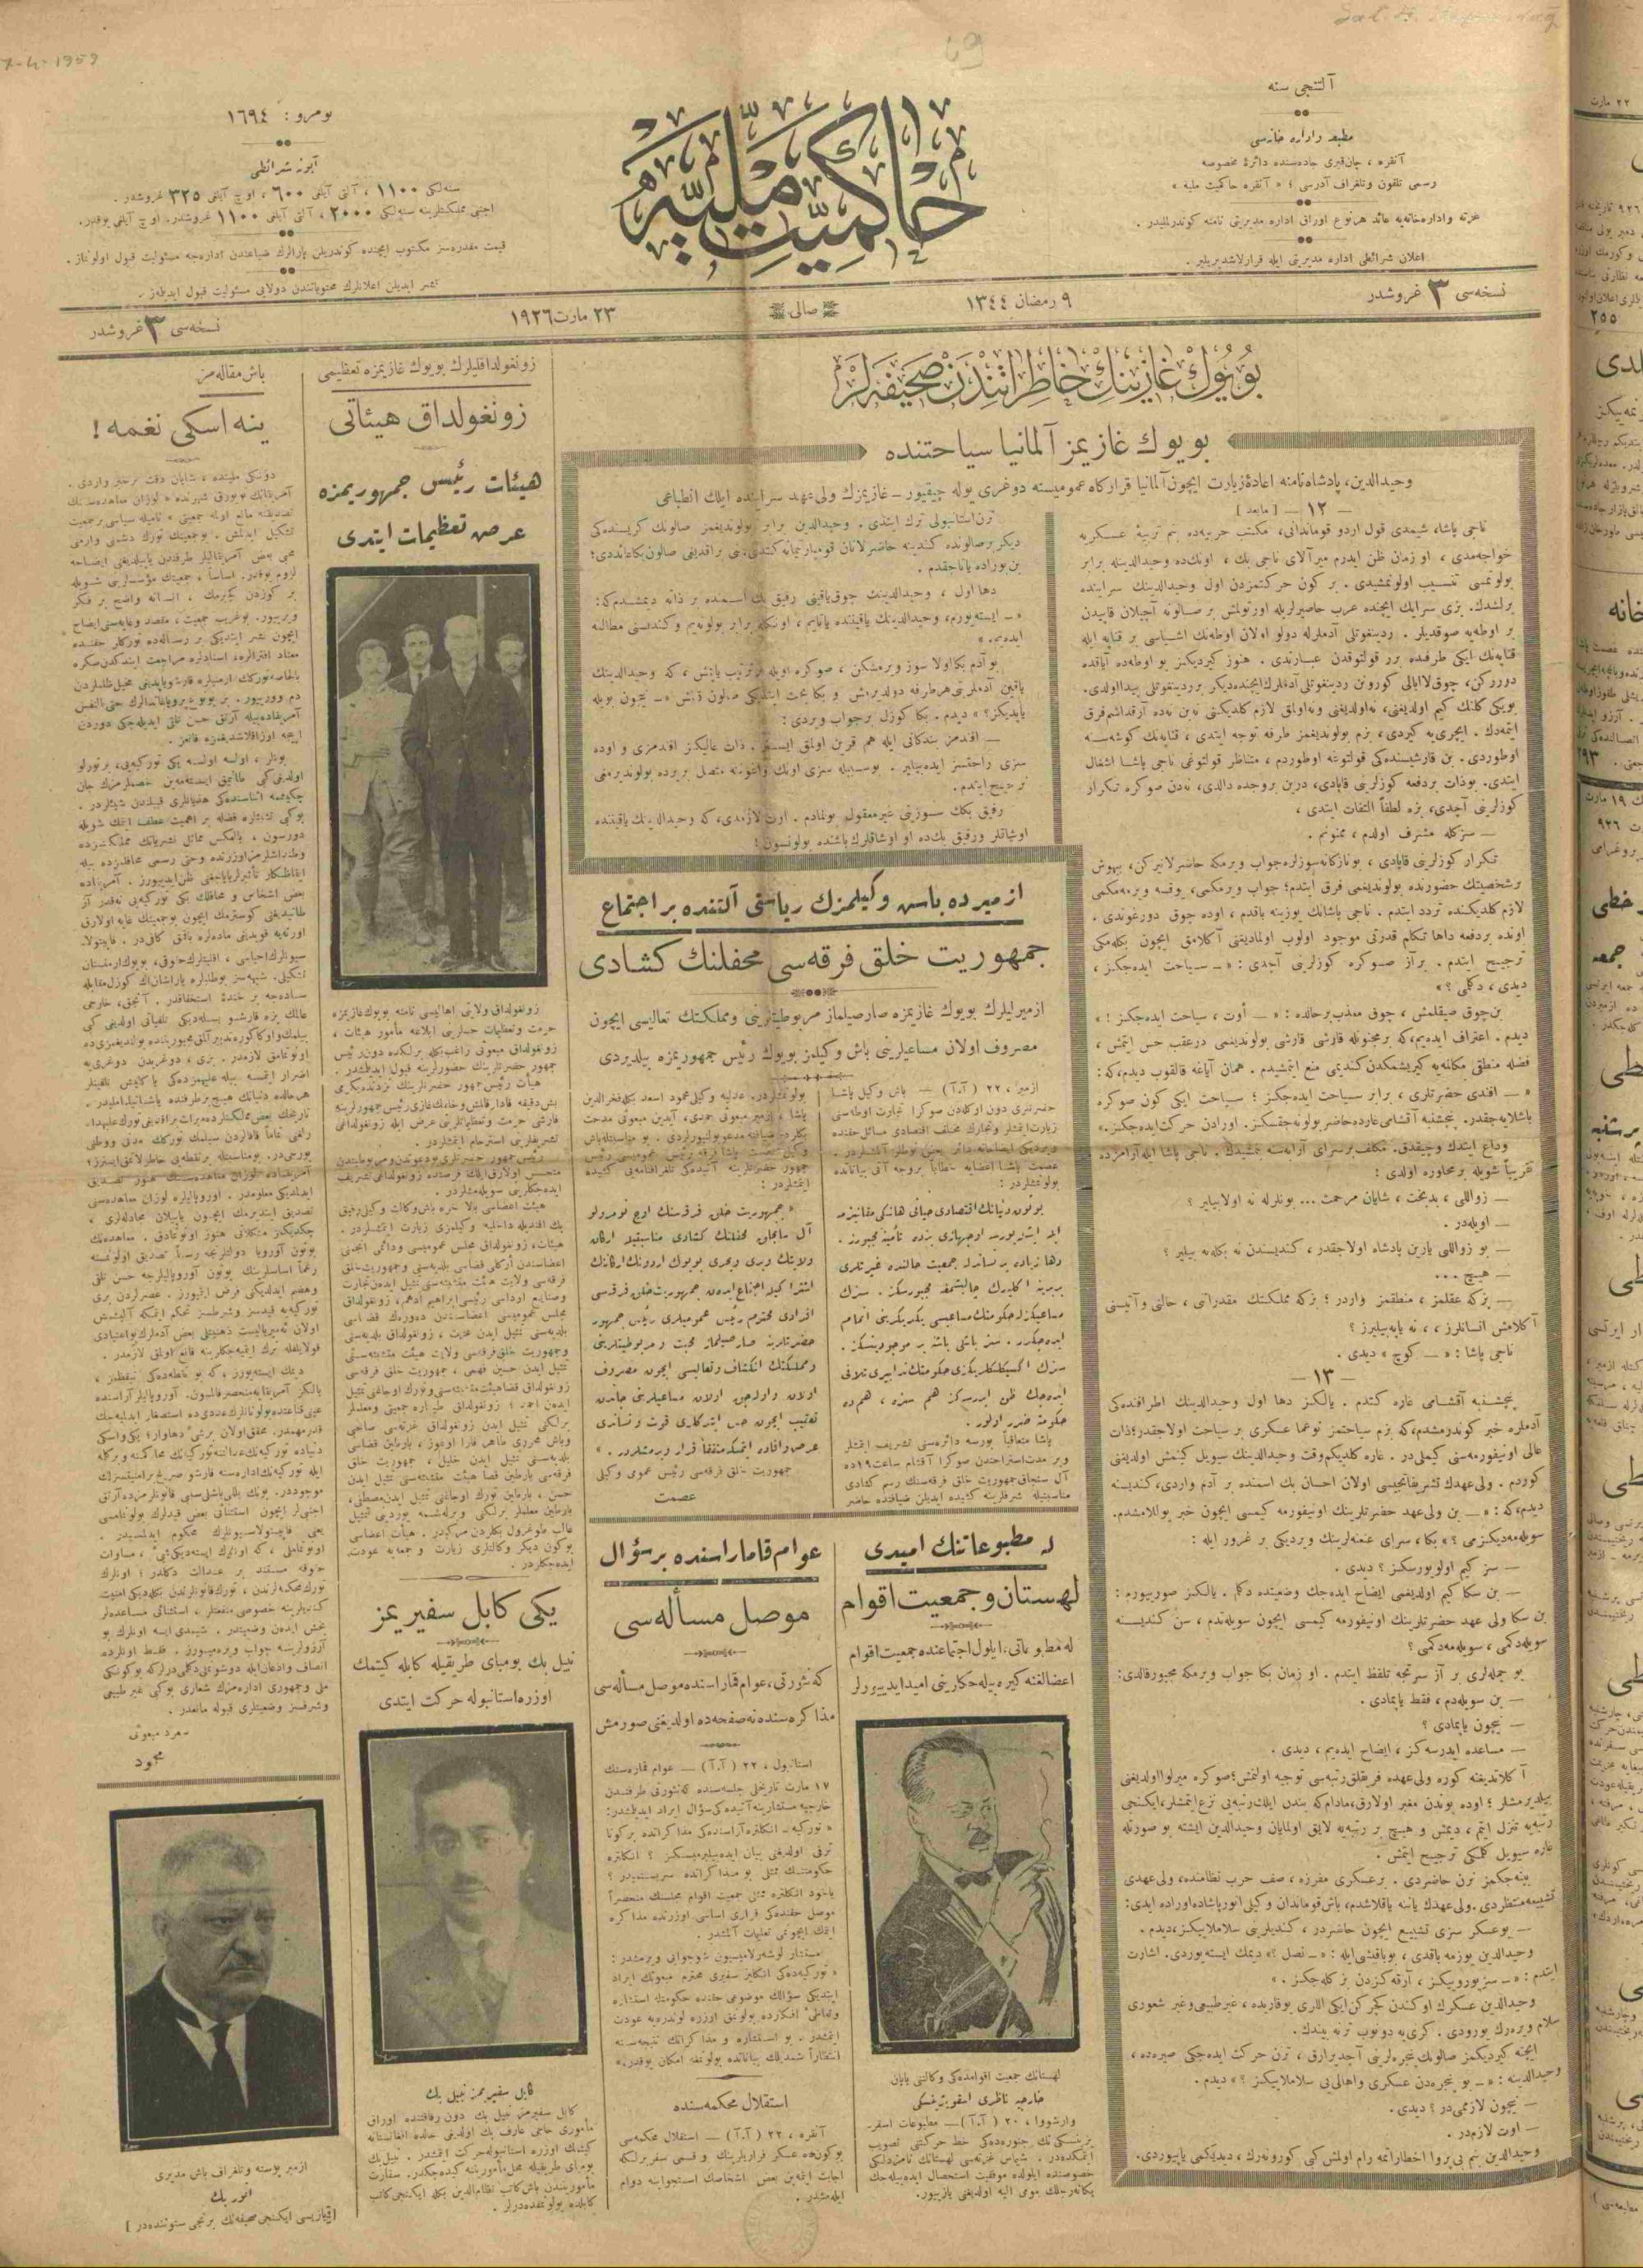 23 Mart 1926 Tarihli Hakimiyet-i Milliye Gazetesi Sayfa 1